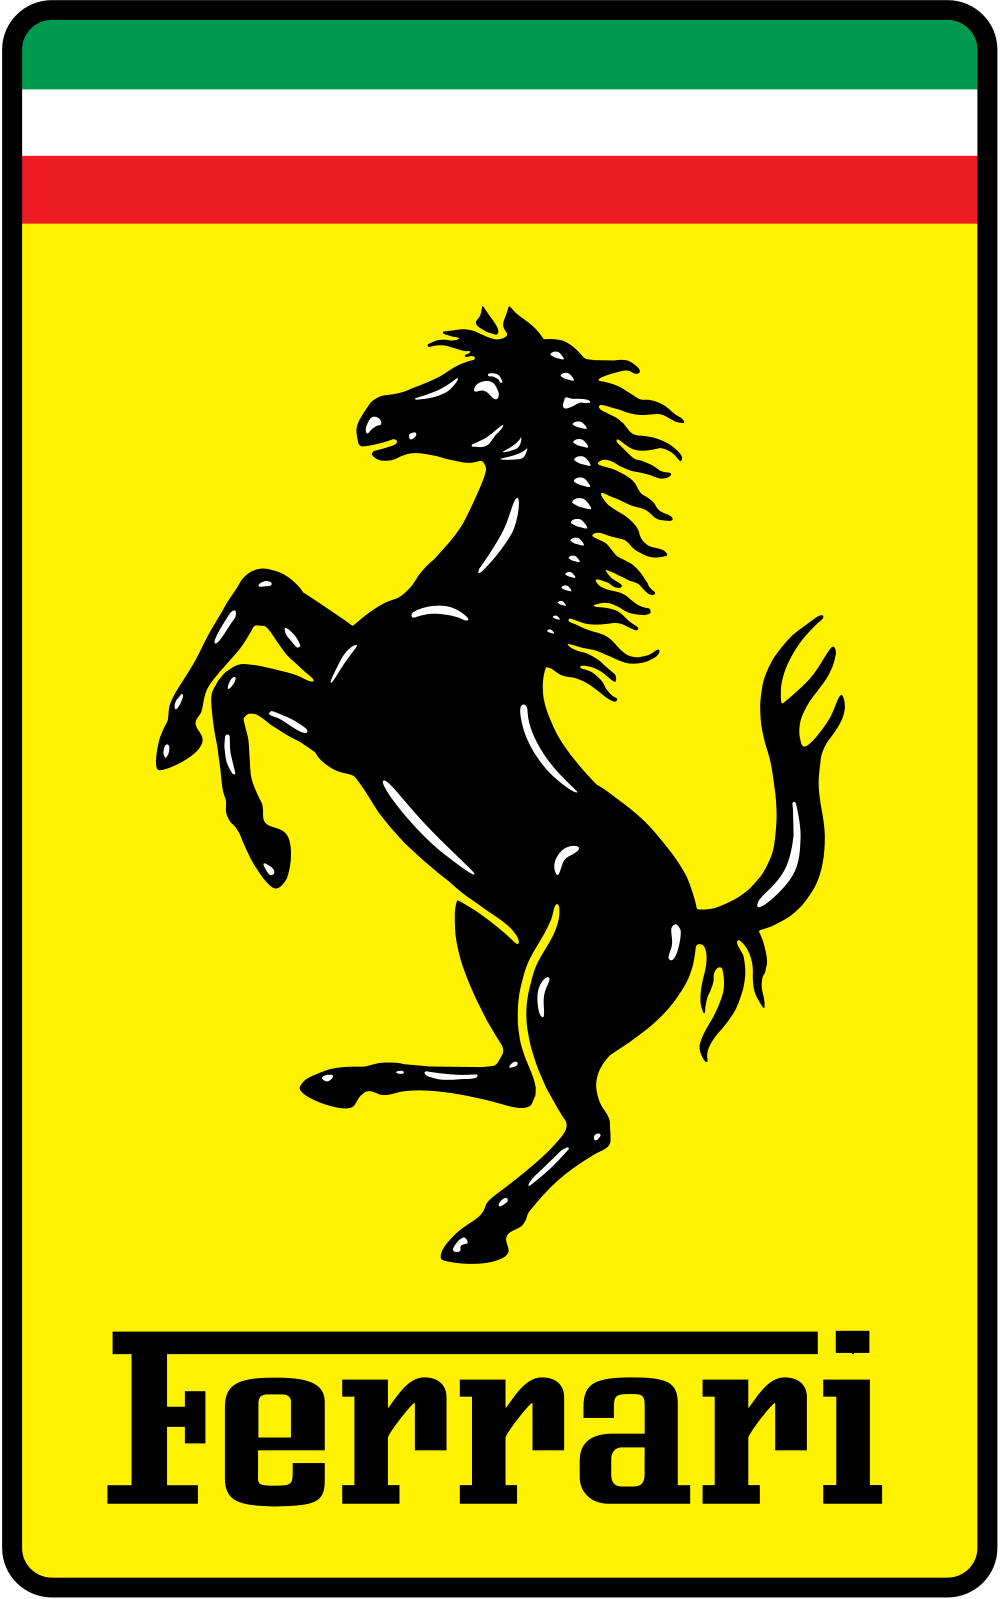 European car brands companies and manufacturers car brand names ferrari company logo biocorpaavc